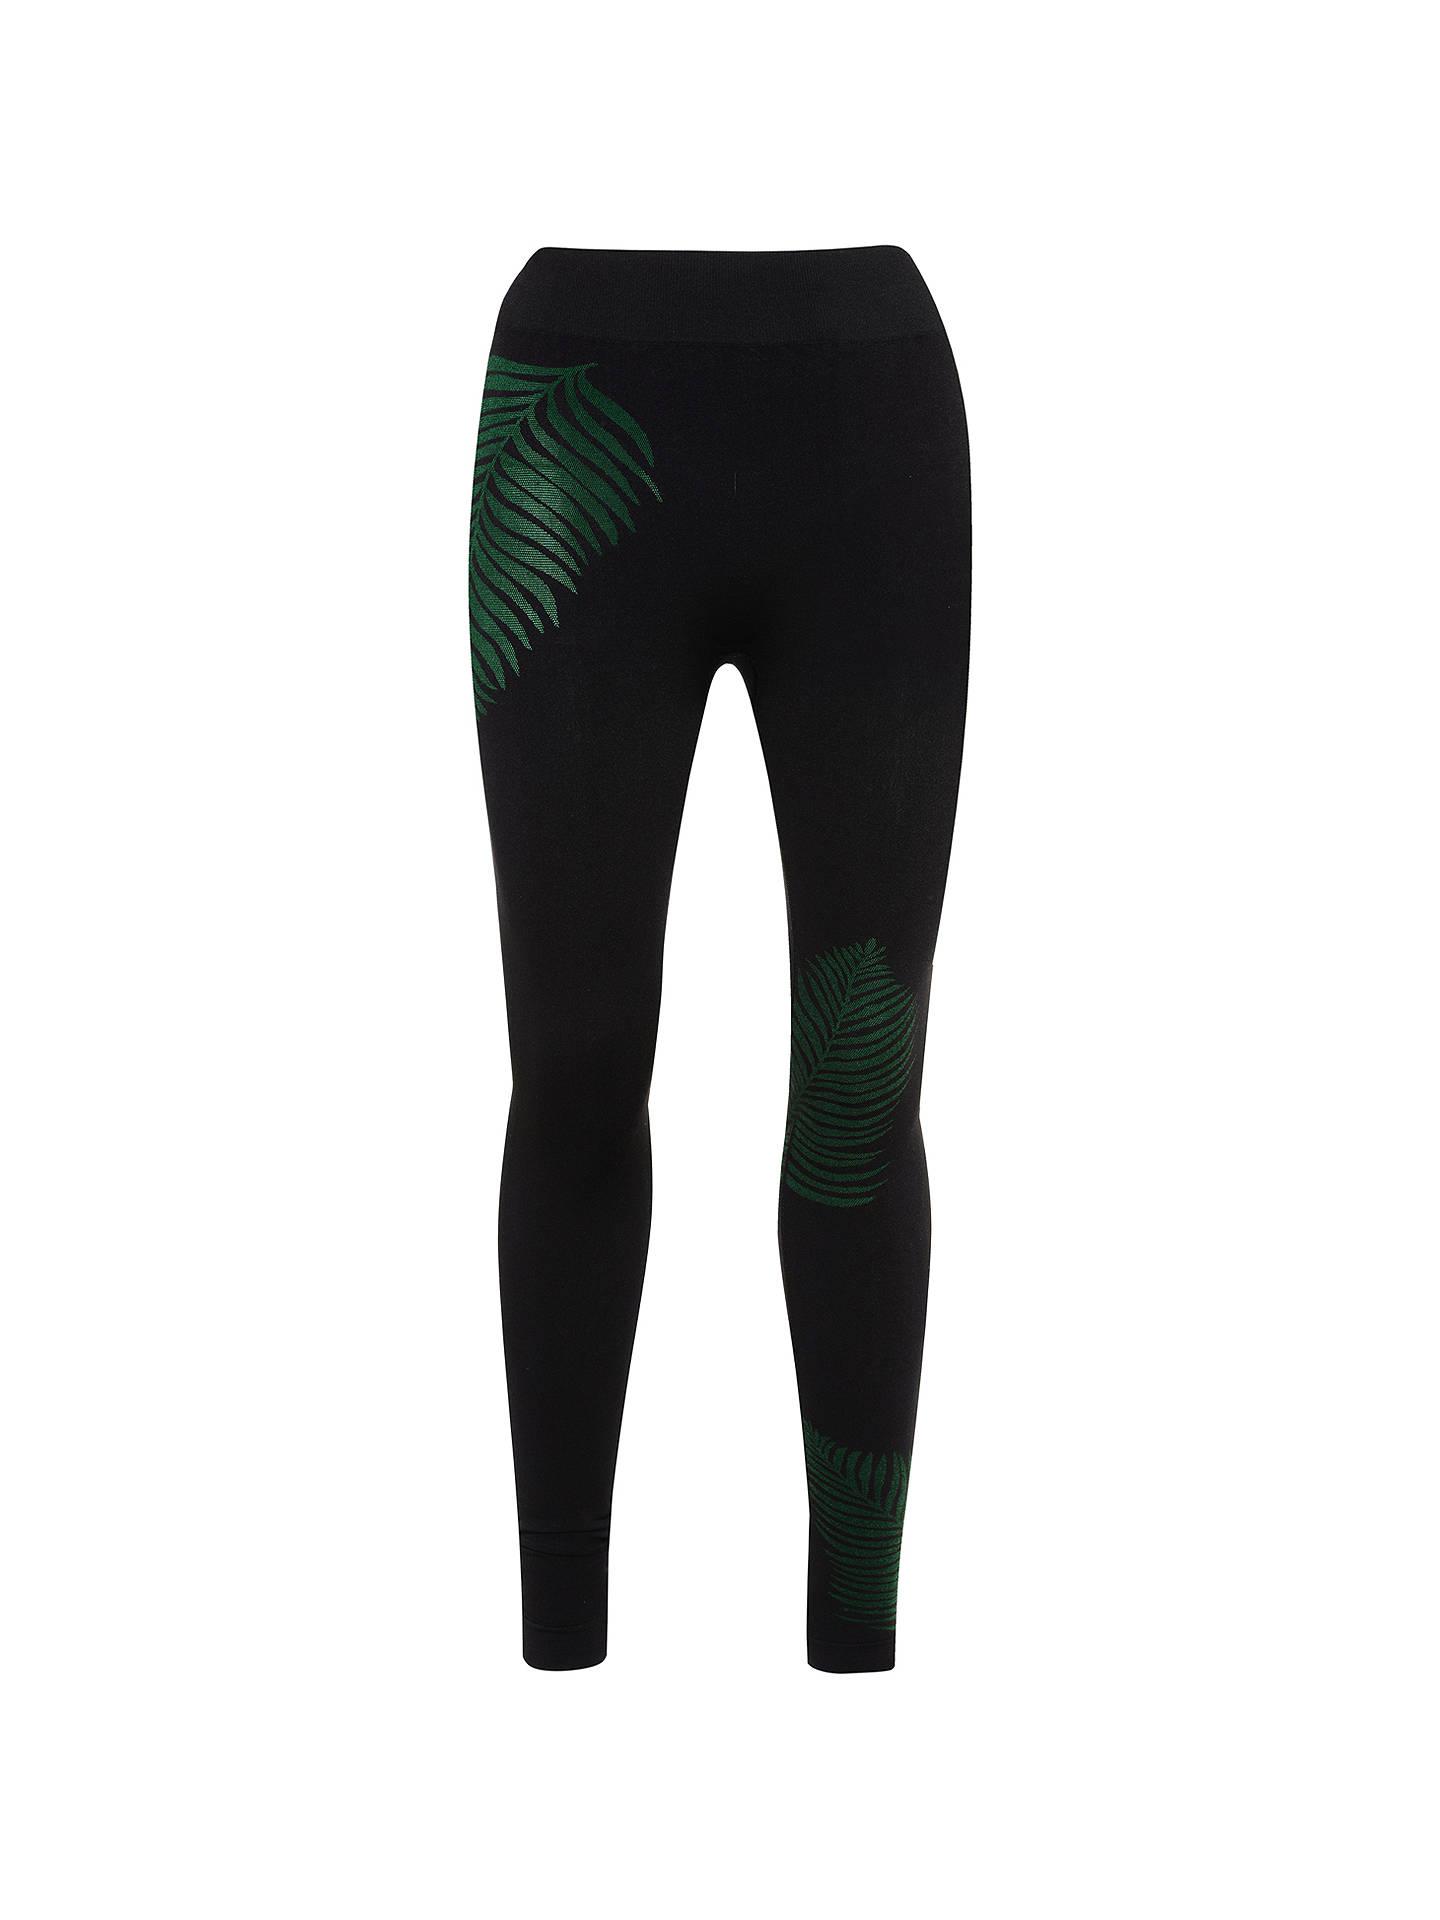 bf35a1c0d9 Buy Manuka Life Primary Leggings, Black/Green, XS/S Online at johnlewis ...